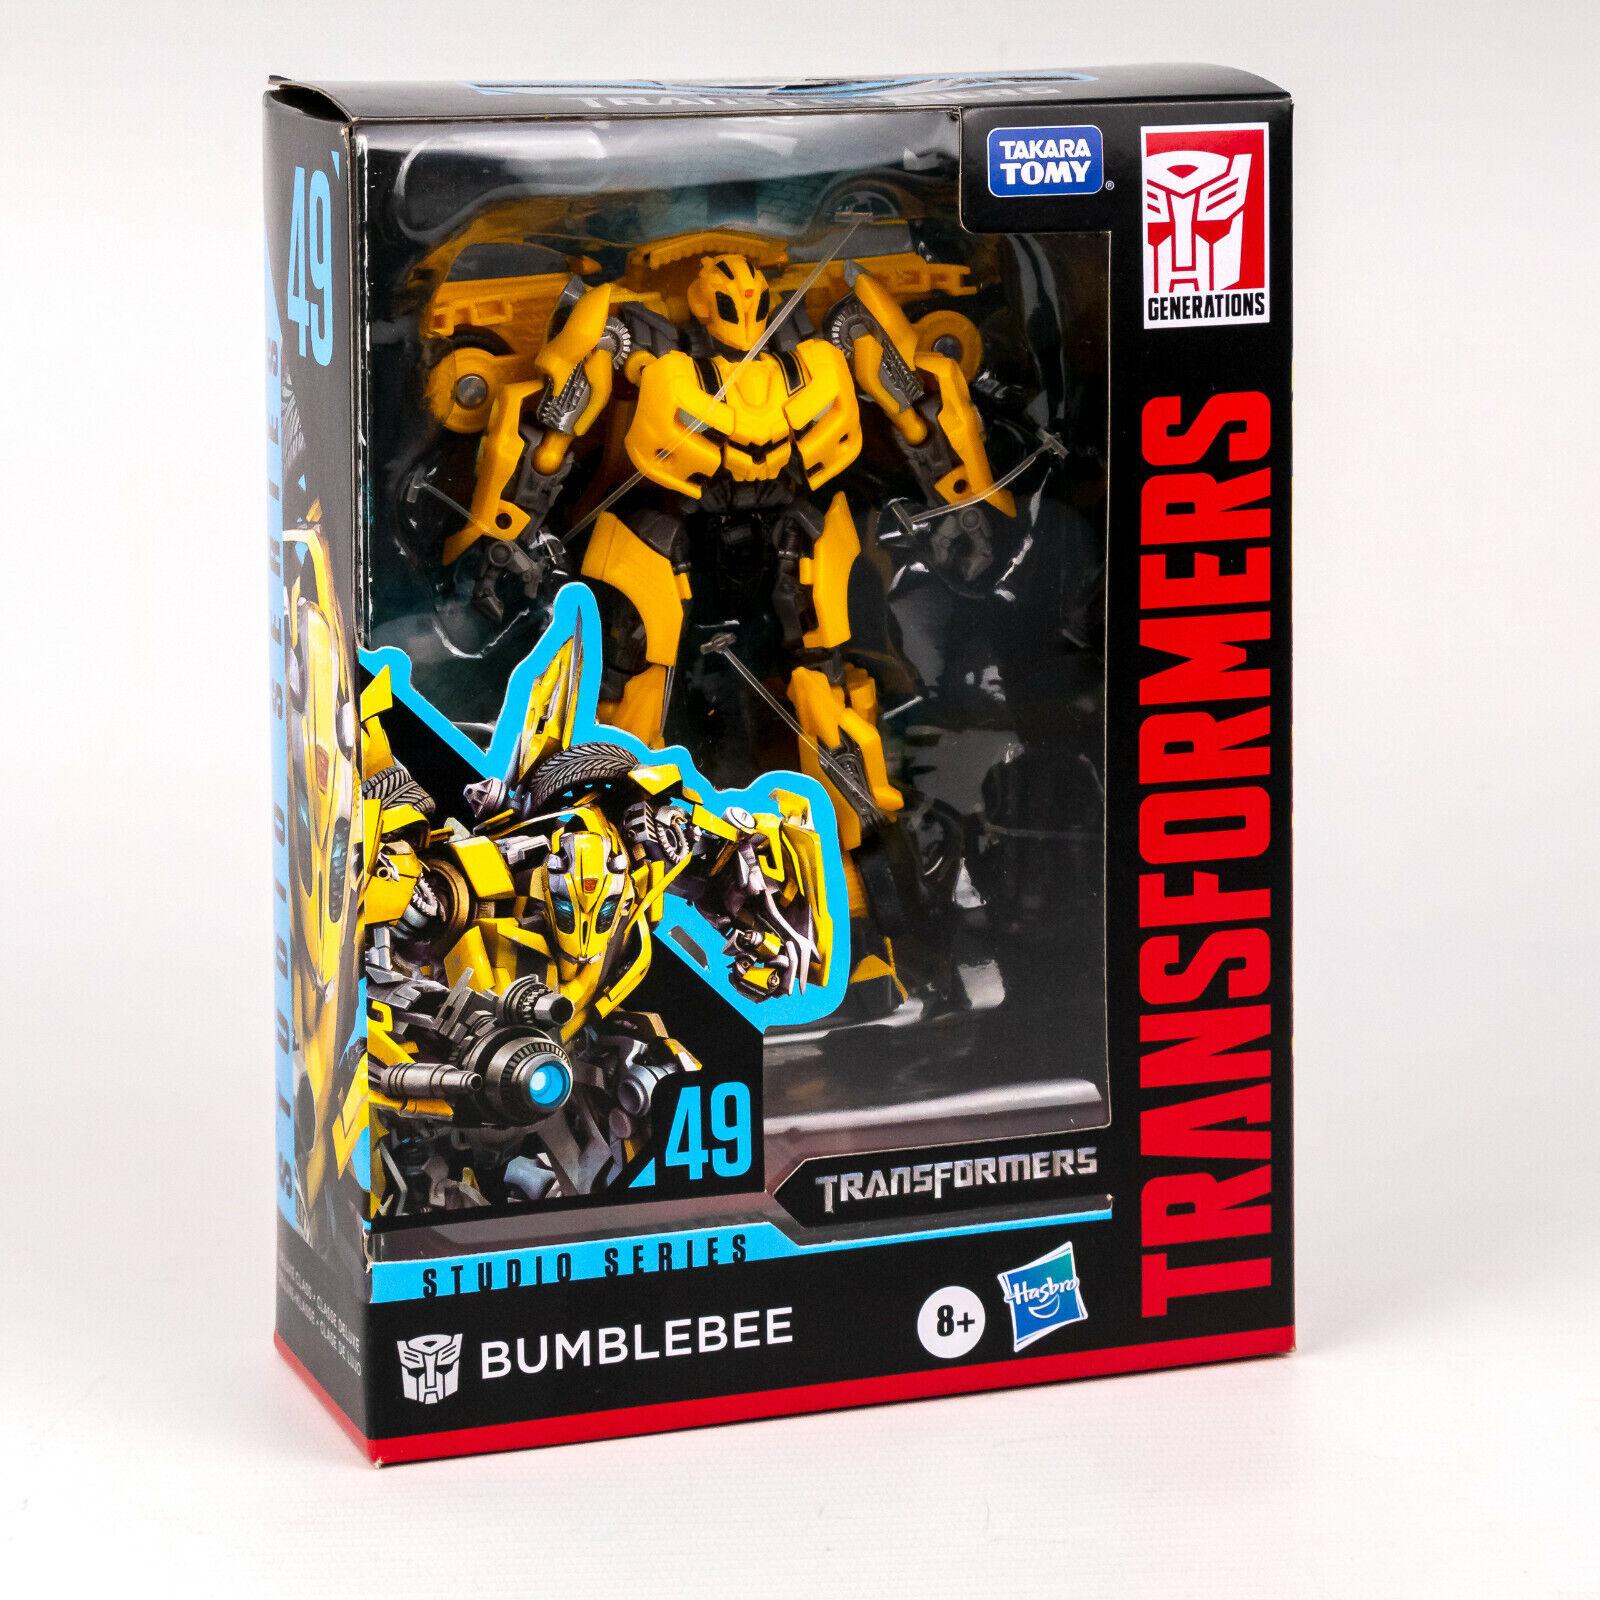 Transformers Actionfigur Bumblebee E7195 Studio Series 49 Deluxe Class